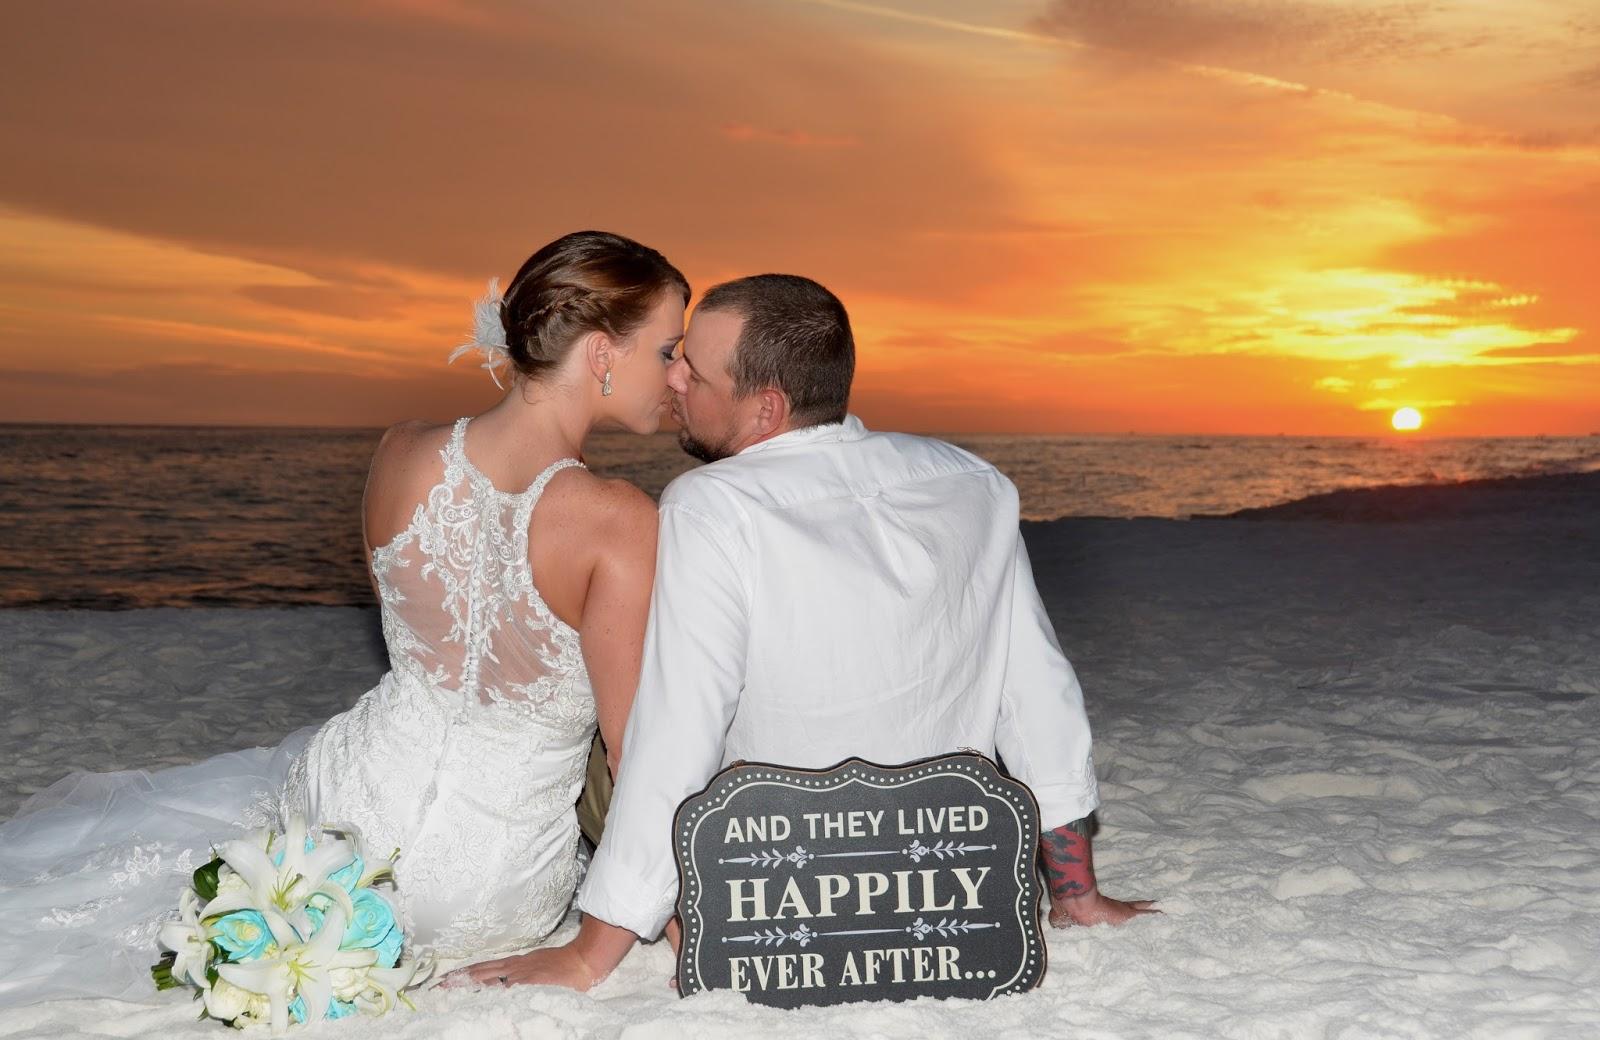 Beach weddings fort walton beach wedding packages sunset beach - Romantic Florida Beach Weddings